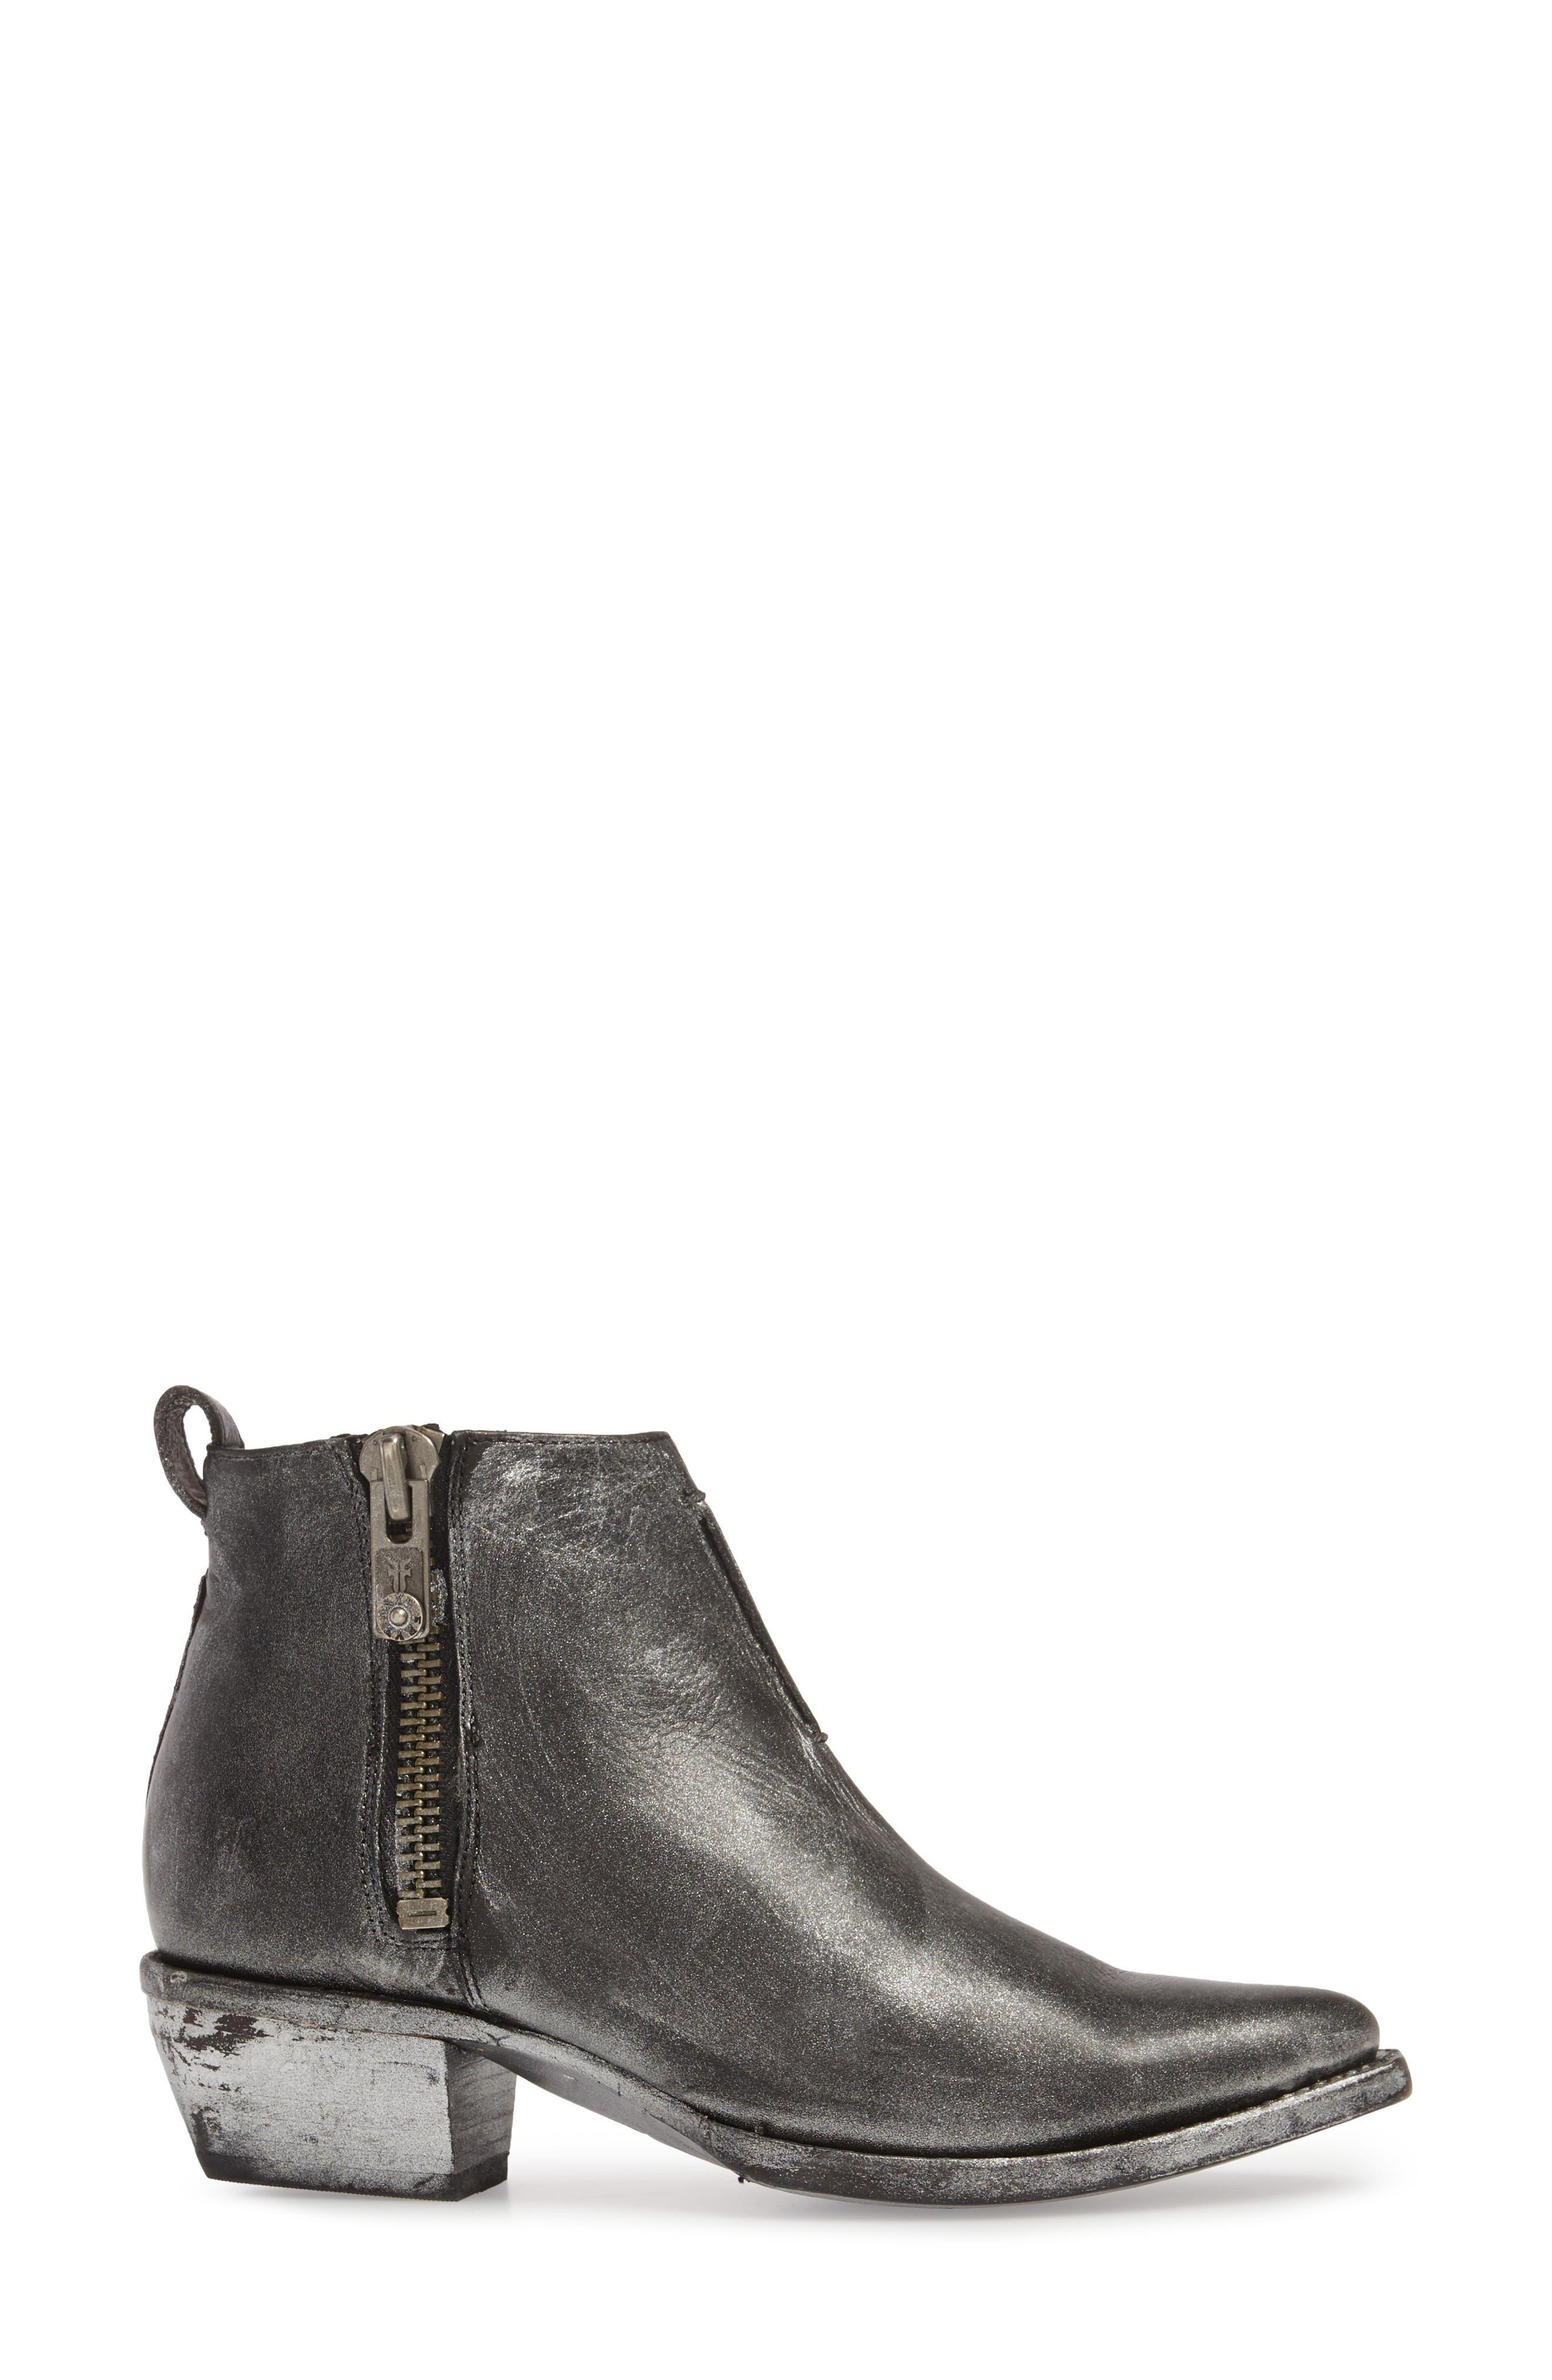 Sacha Moto Short Bootie,                             Alternate thumbnail 3, color,                             Black Metallic Leather